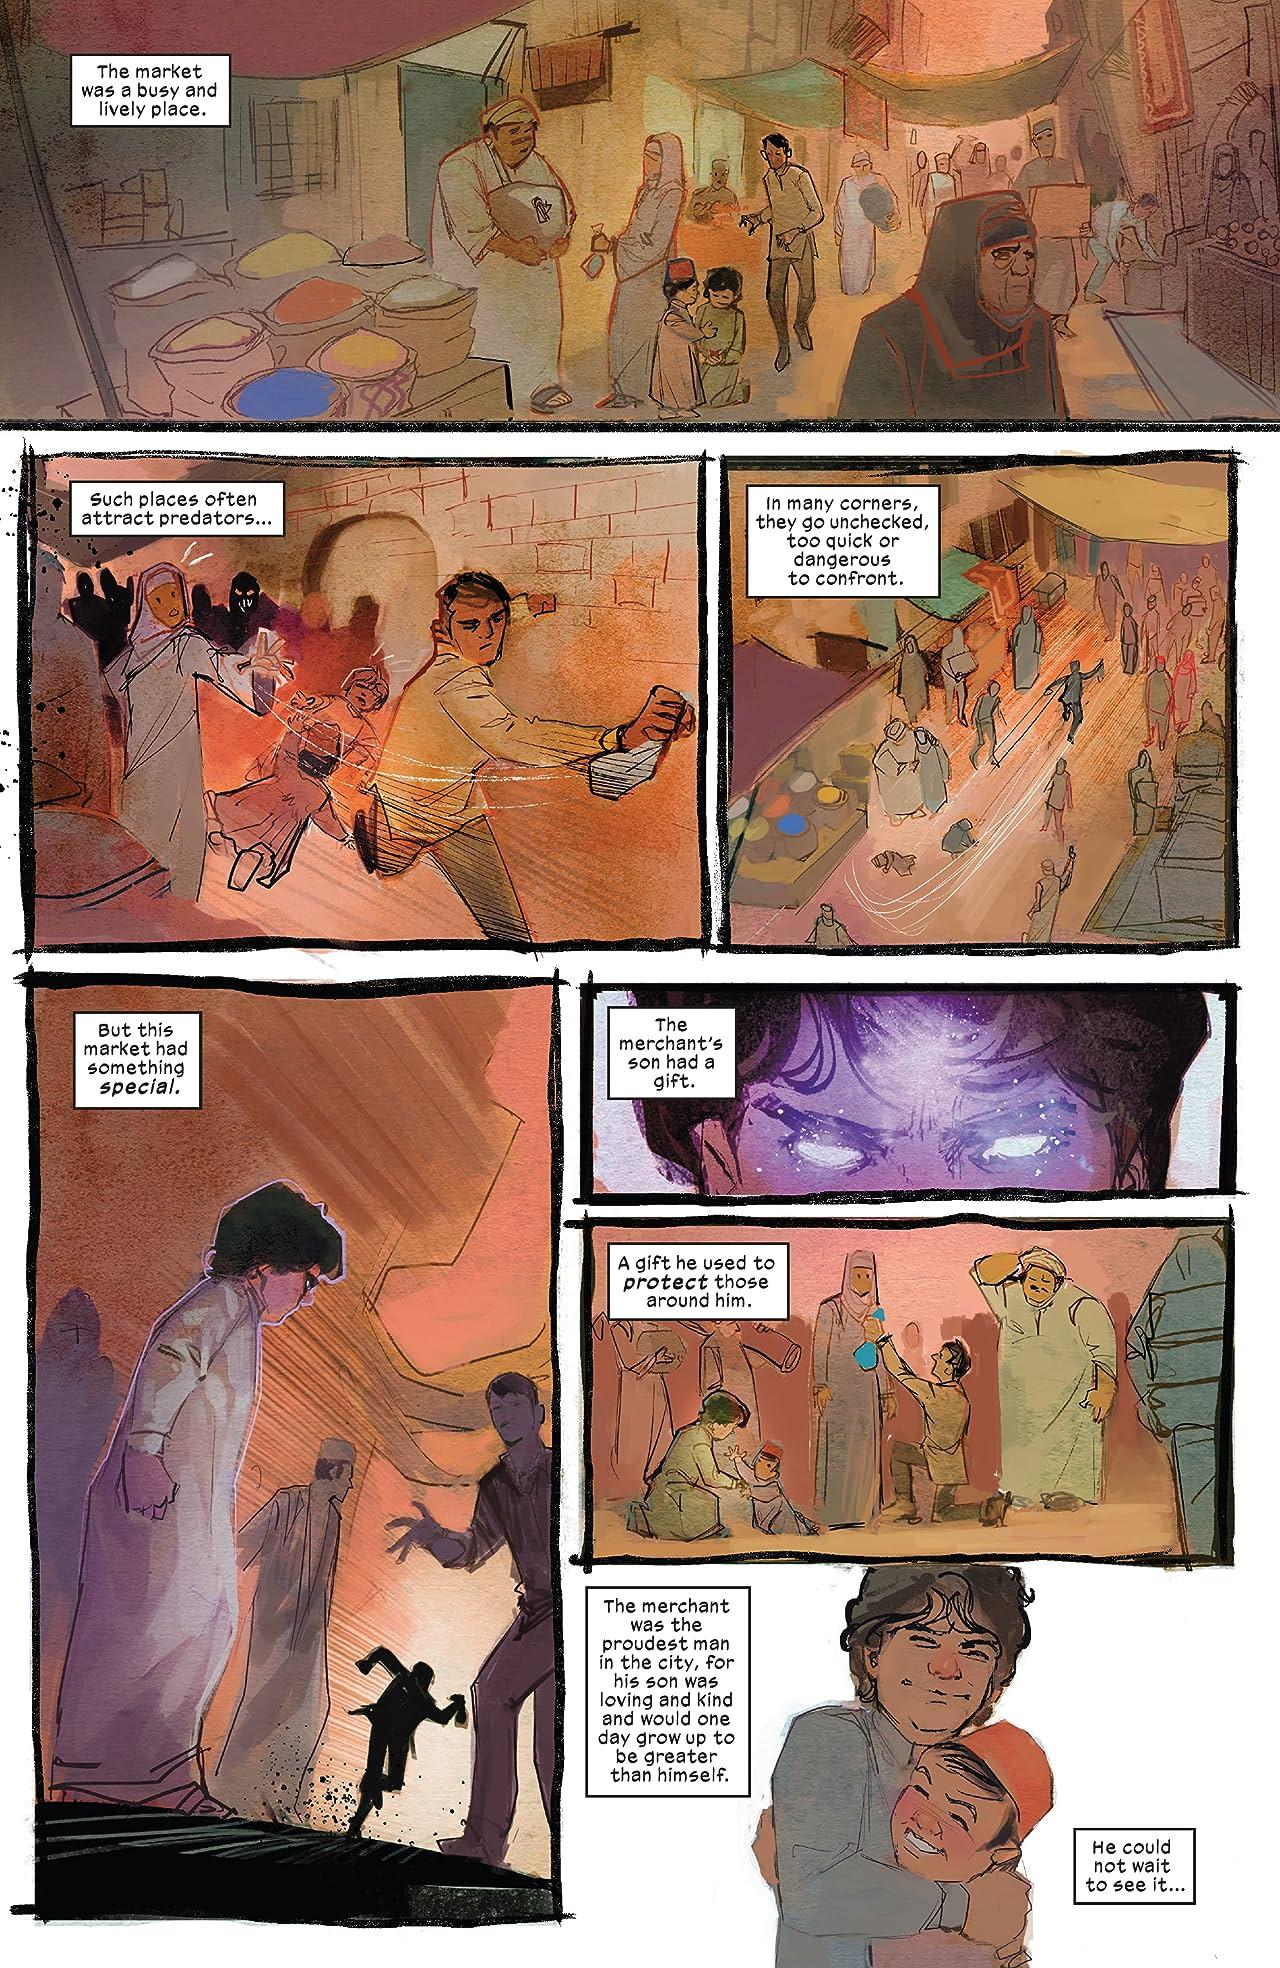 New Mutants By Vita Ayala Vol. 1